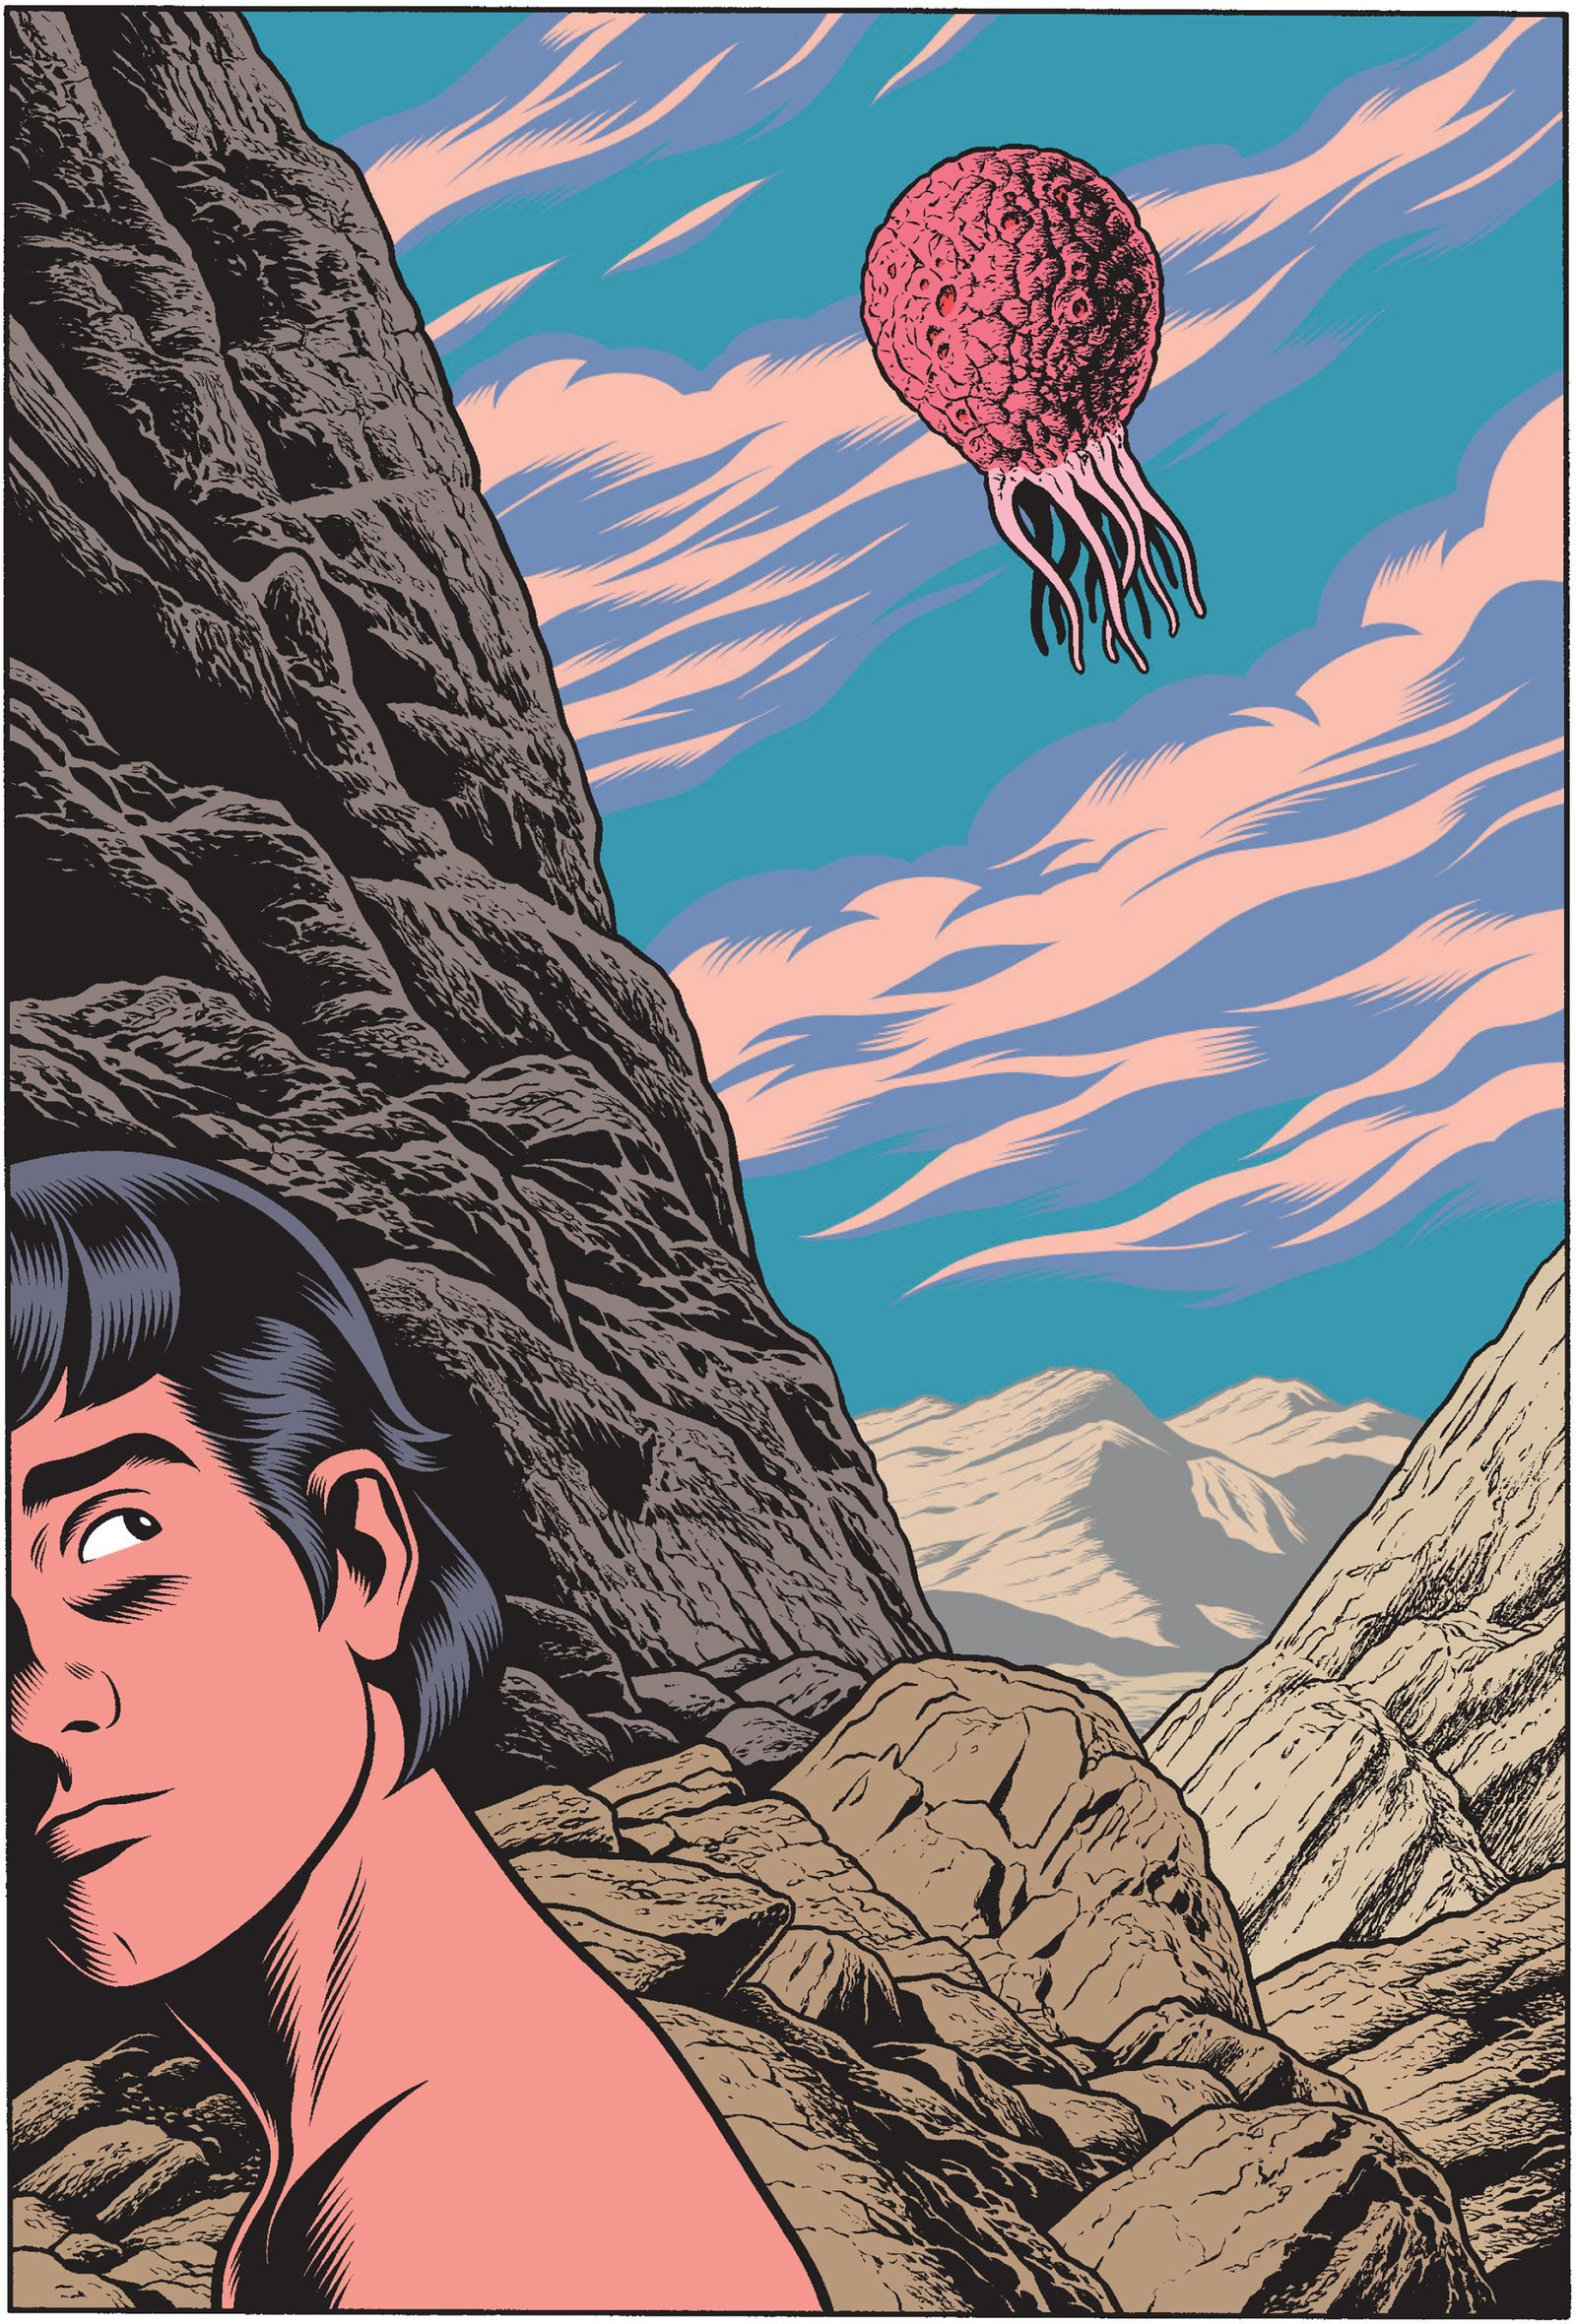 Comic/ Charles Burns: Daidalos 1